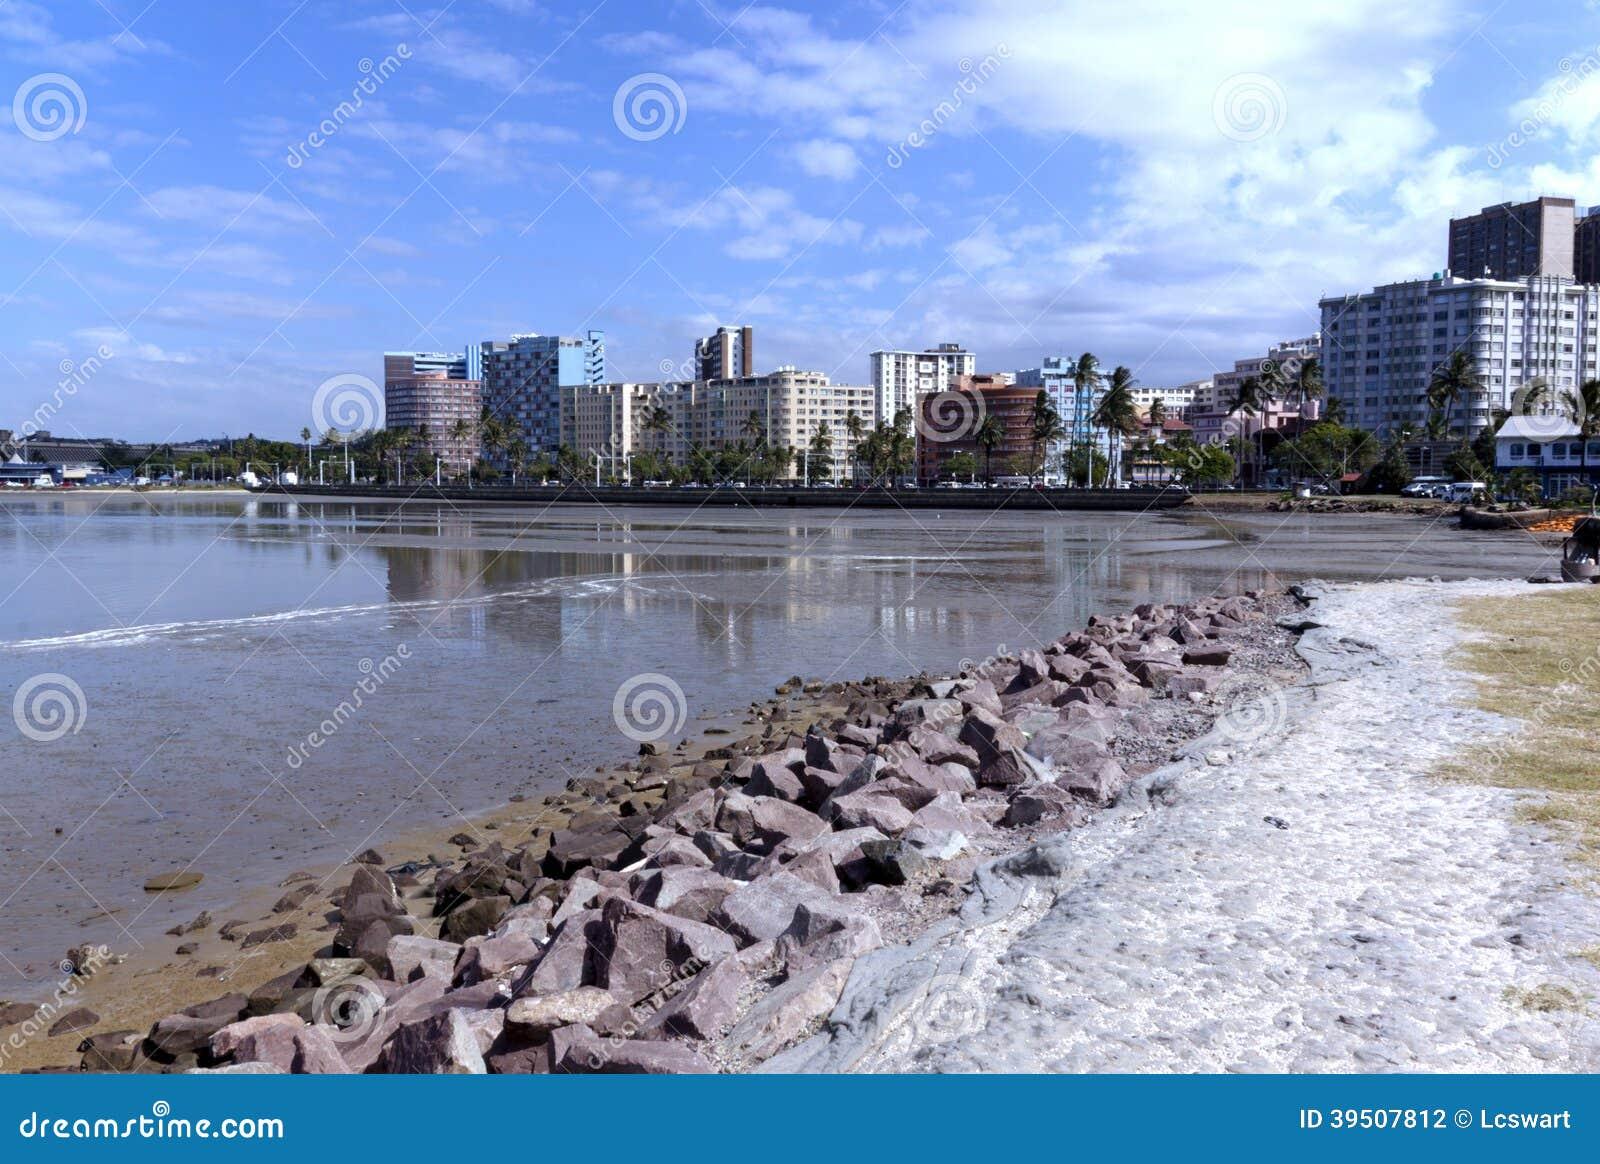 Durban Harbor with Residential Buildings on Esplanade in Backgro